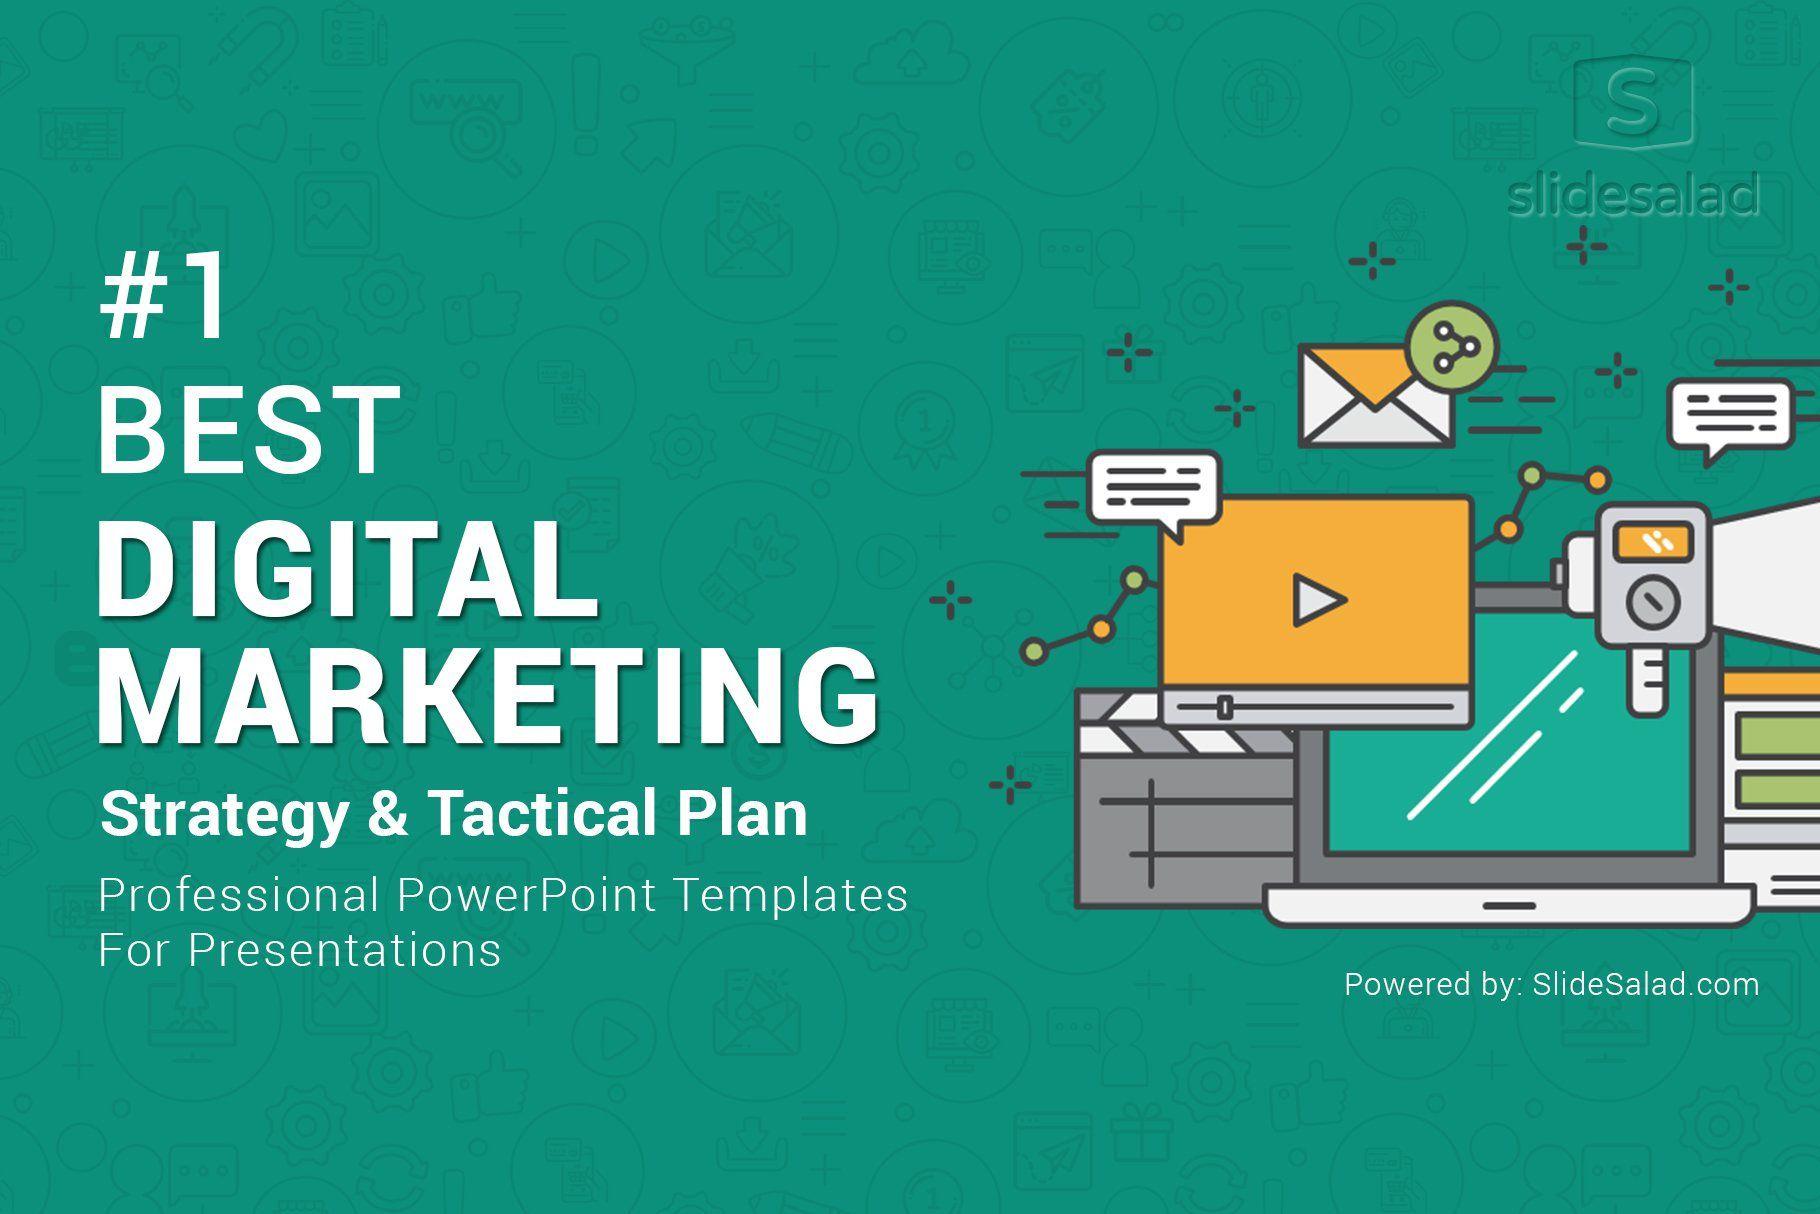 009 Magnificent Digital Marketing Plan Template Ppt Example  Presentation Free SlideshareFull